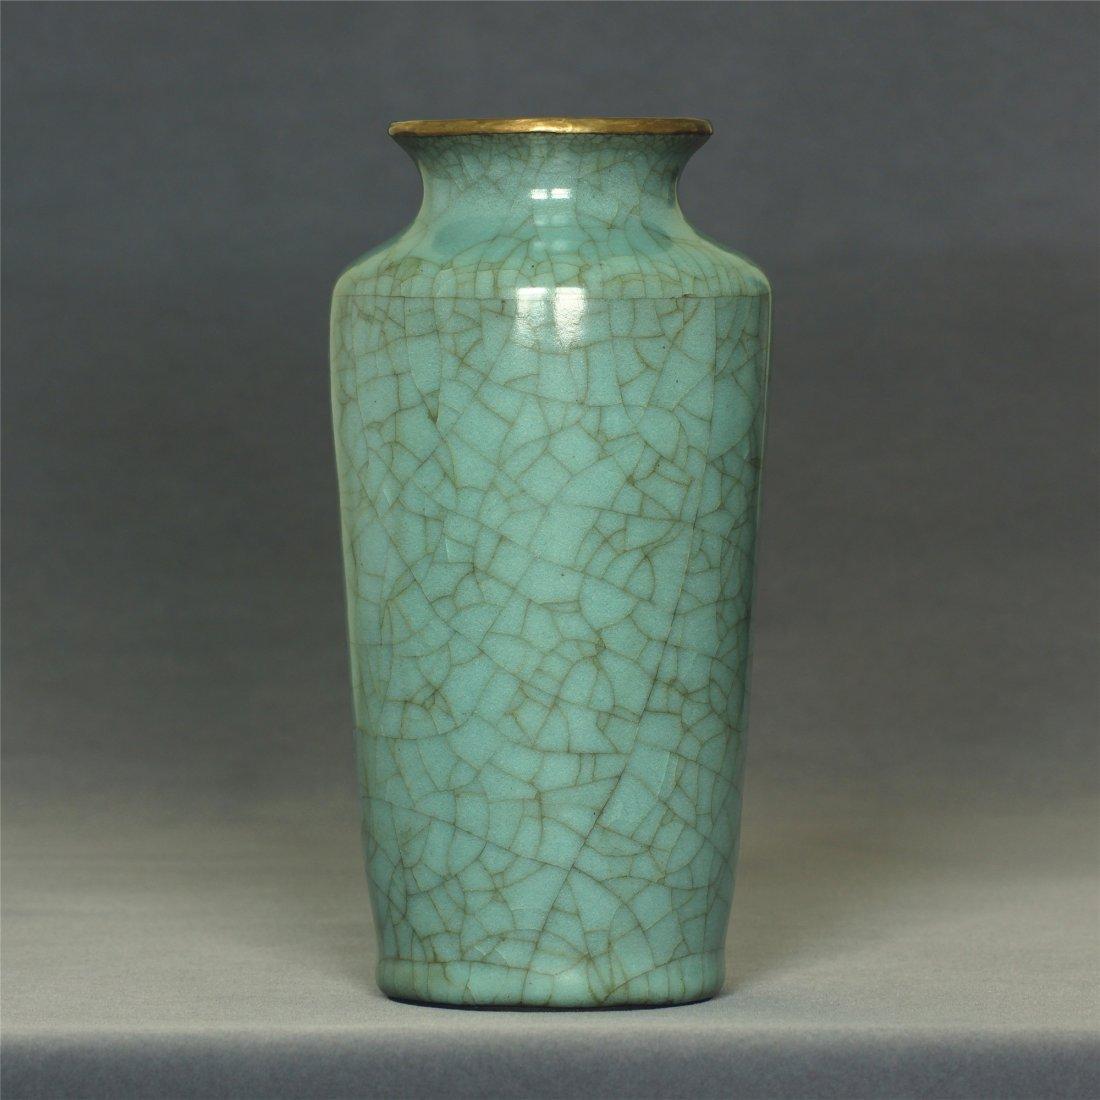 A Guan-Kiln Vase Southern Song Dynasty.